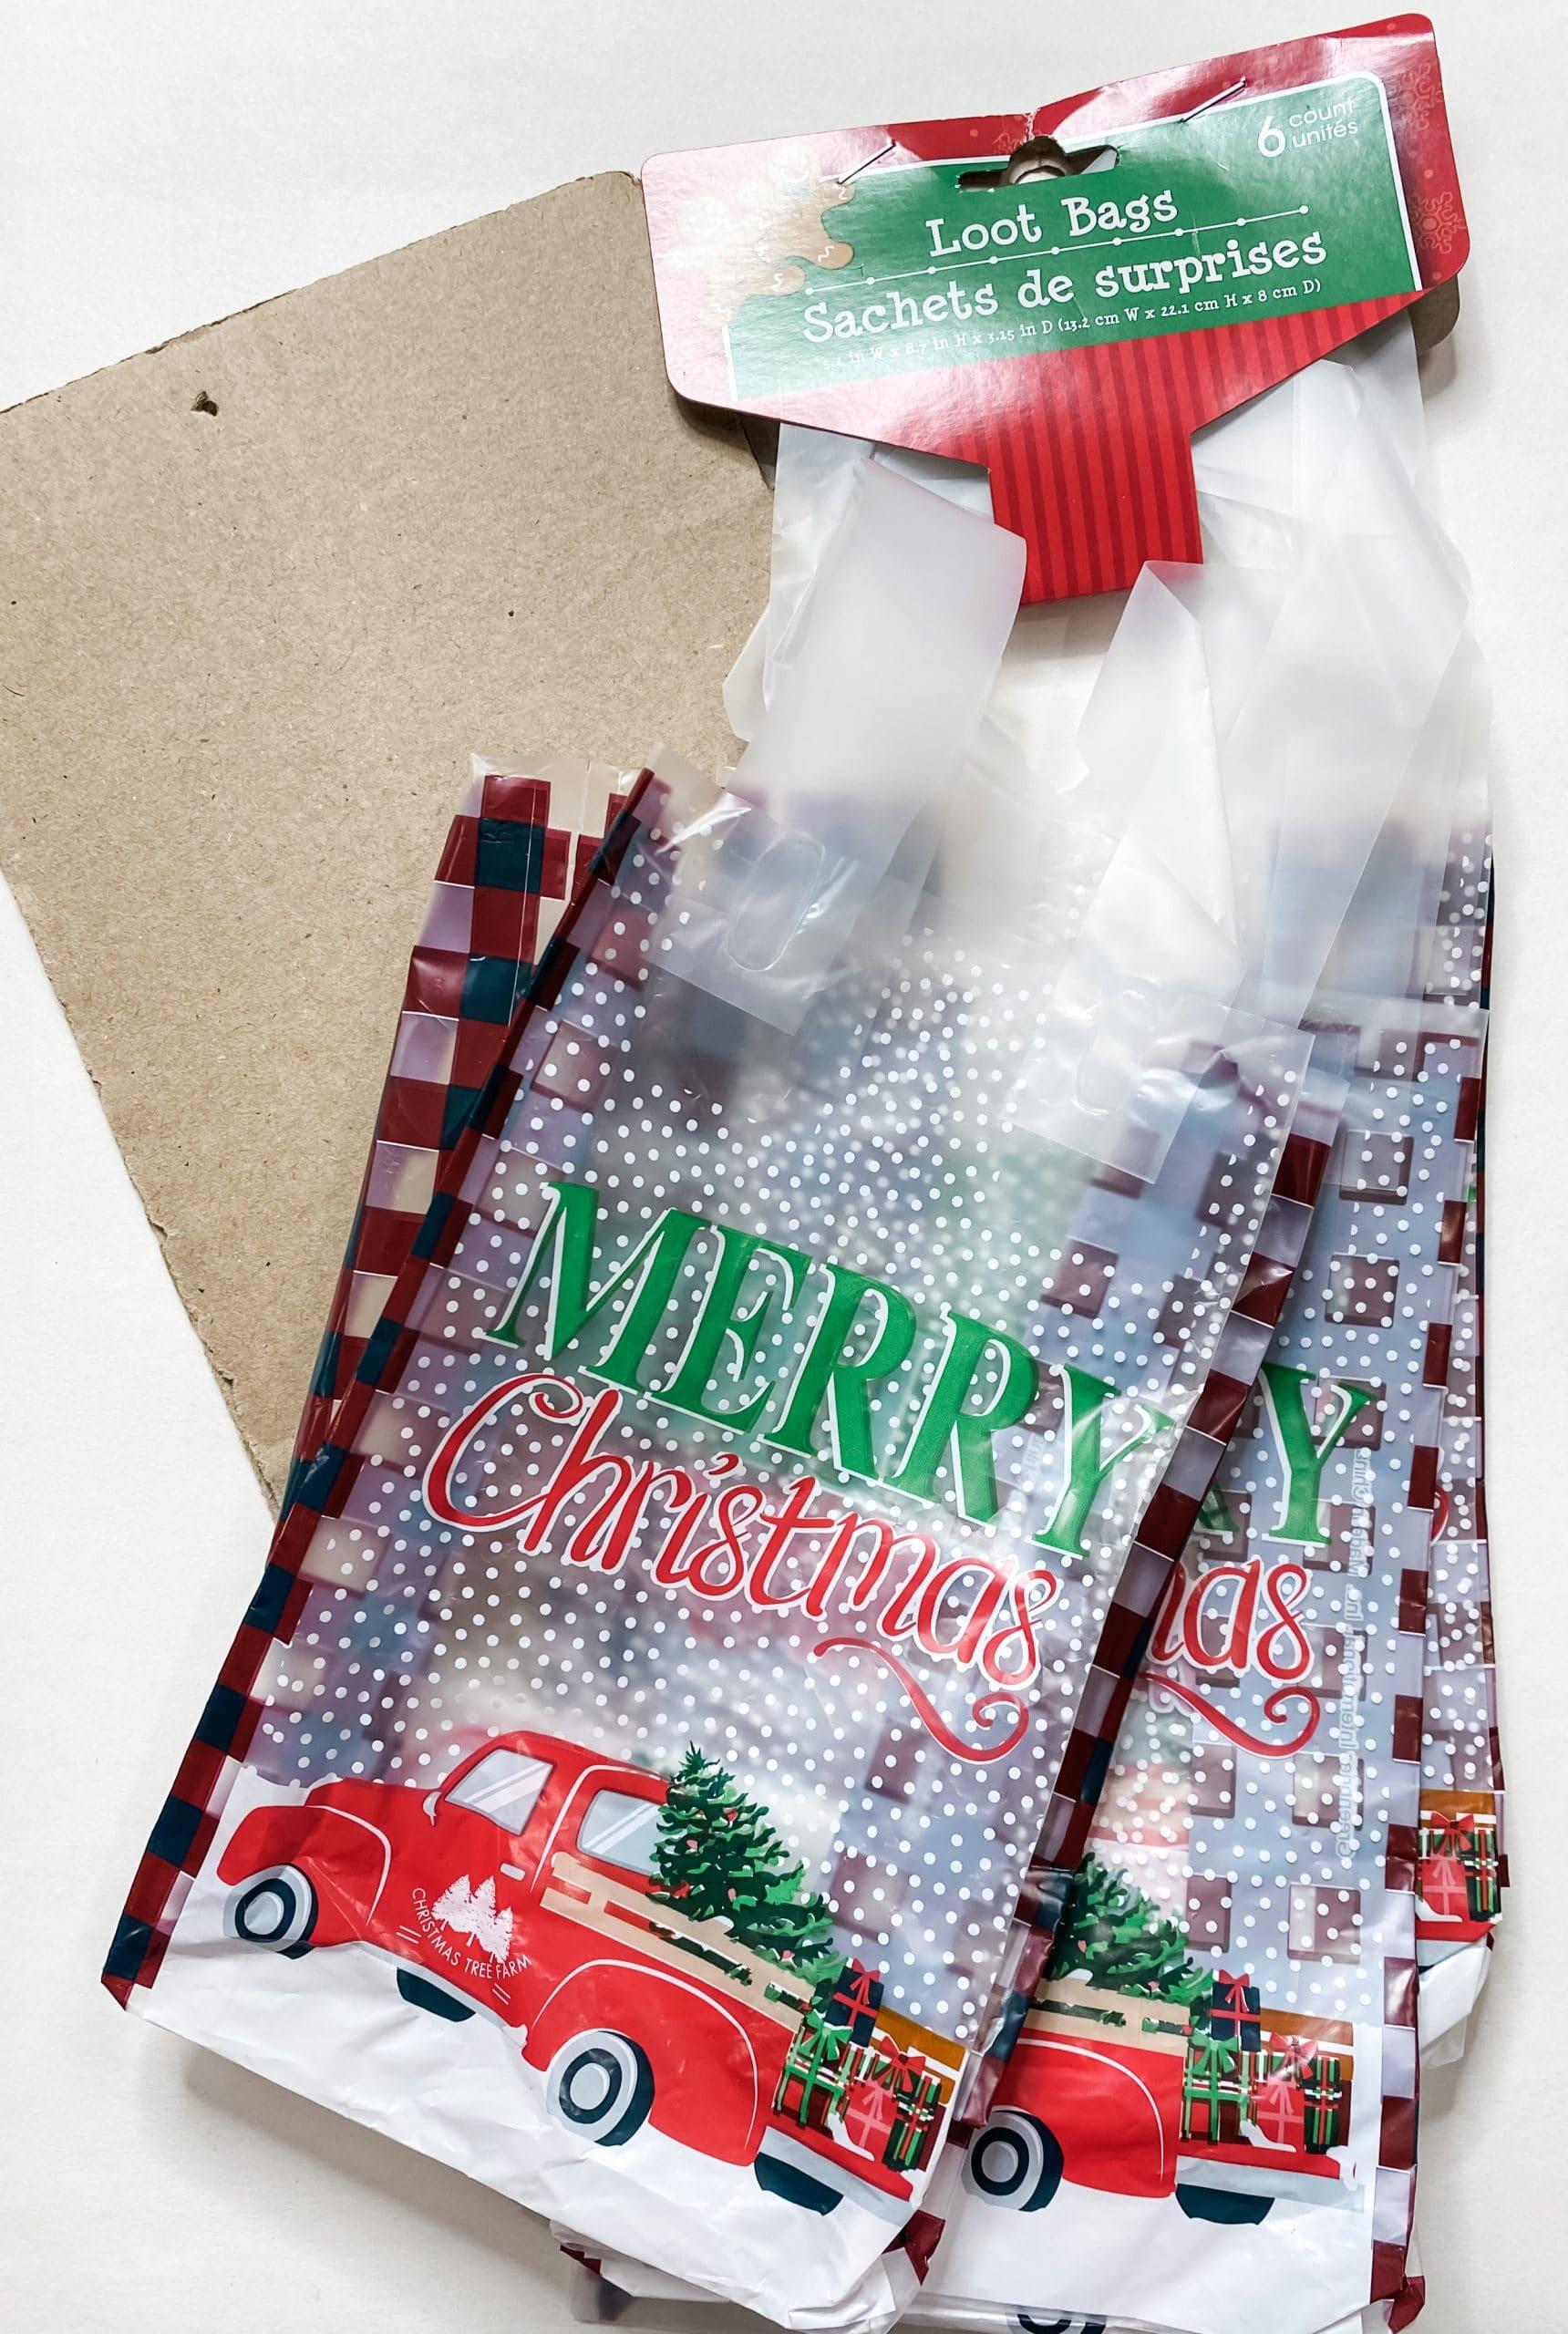 Easy Dollar Tree Christmas Loot Bag DIY Decor